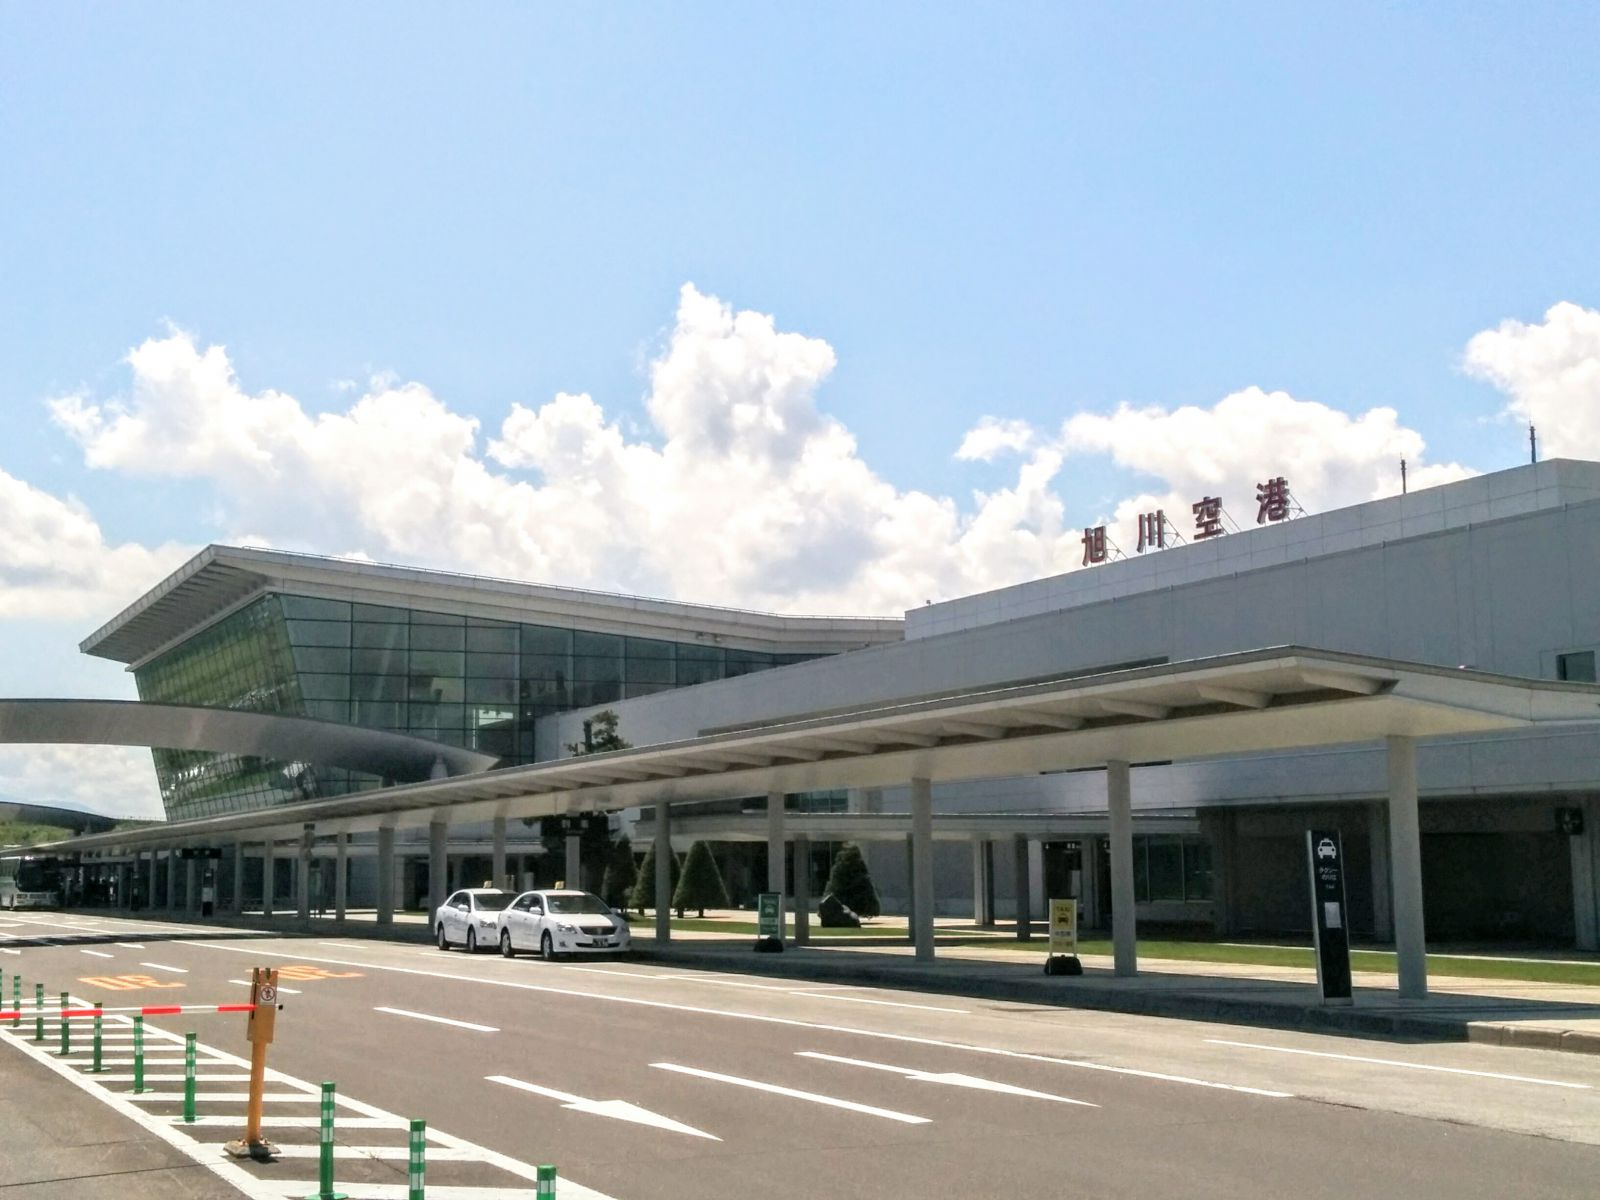 【旭川空港】旭川空港観光タクシー